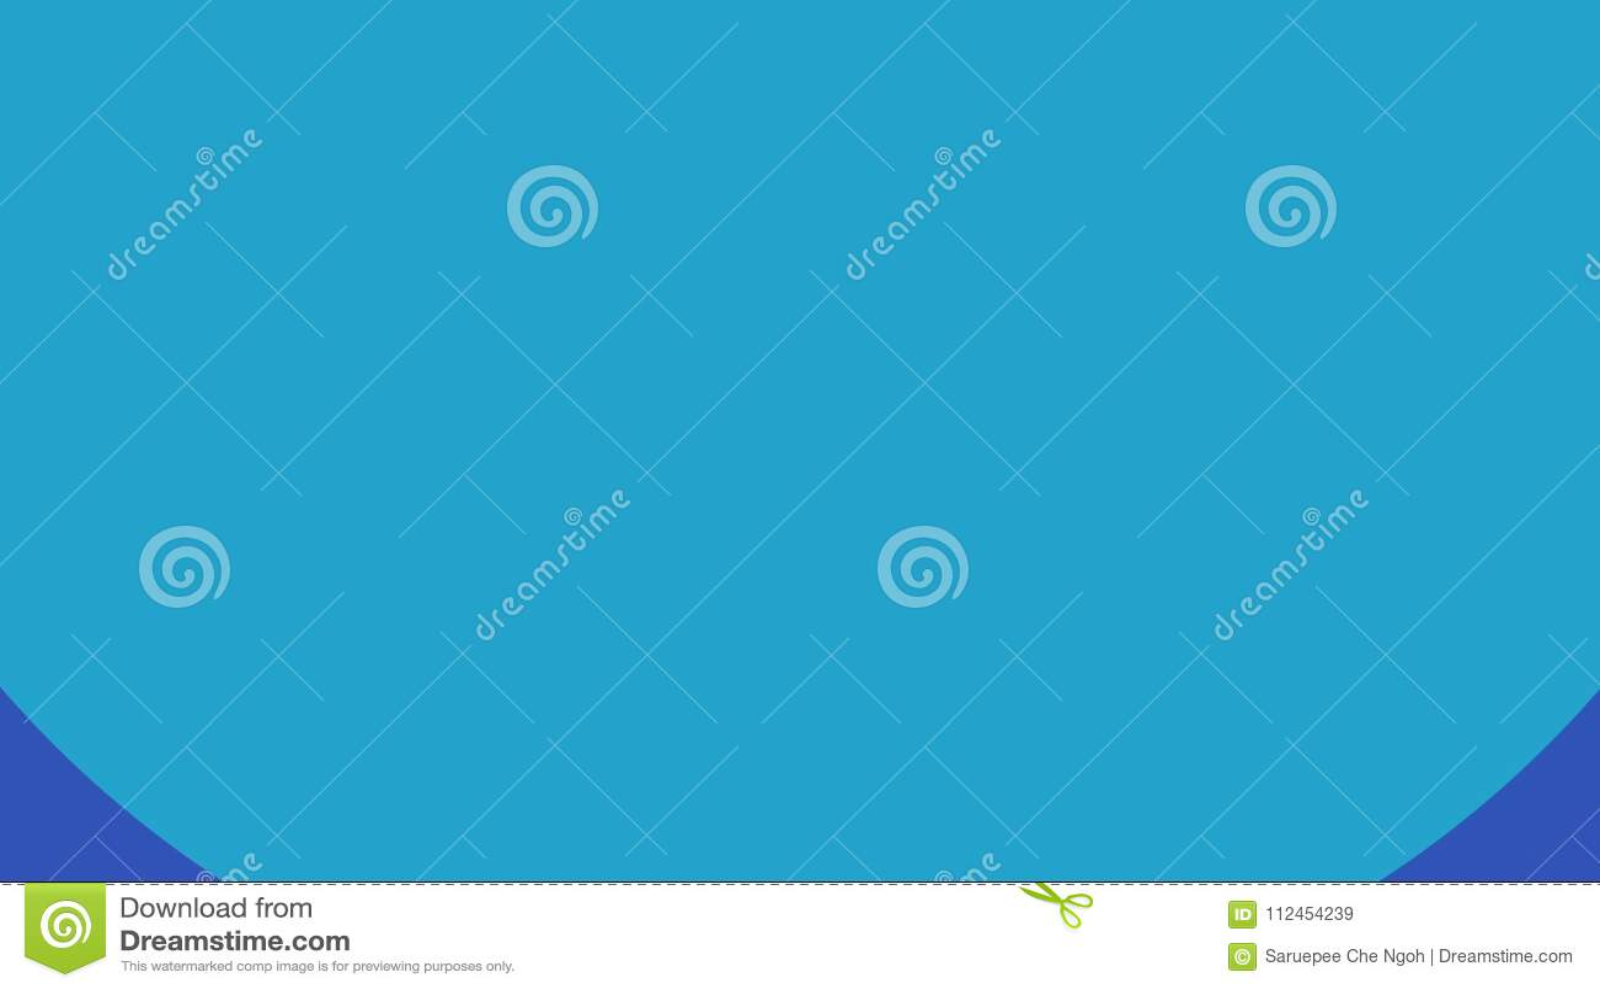 Basic Clean Transition, Wipe, Slide, Minimal Styles On Green Screen